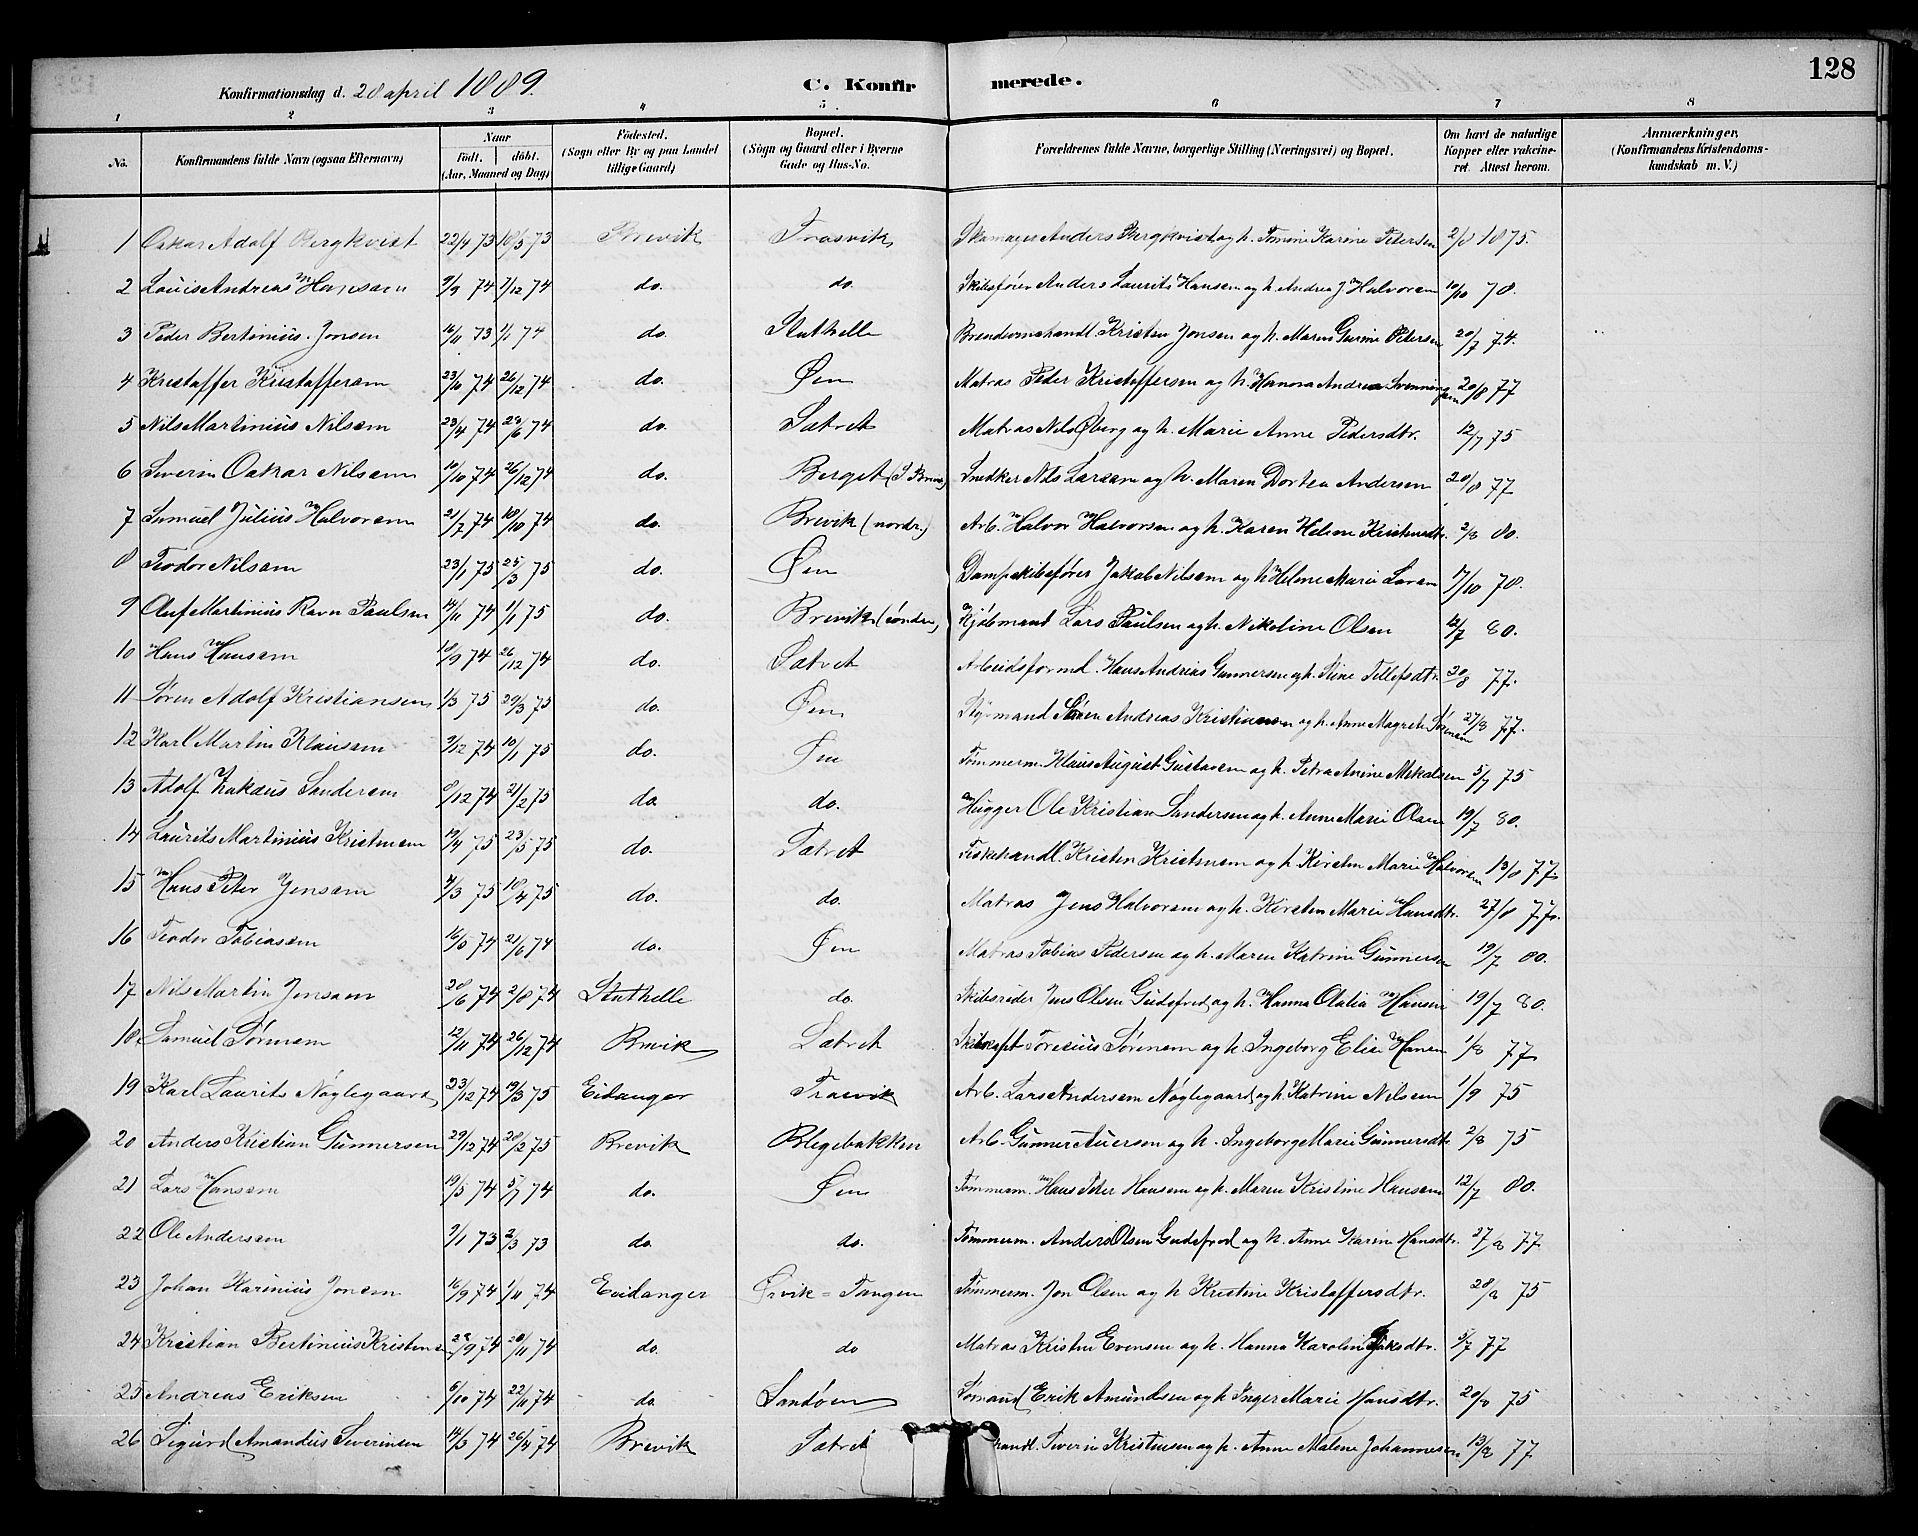 SAKO, Brevik kirkebøker, G/Ga/L0004: Klokkerbok nr. 4, 1882-1900, s. 128